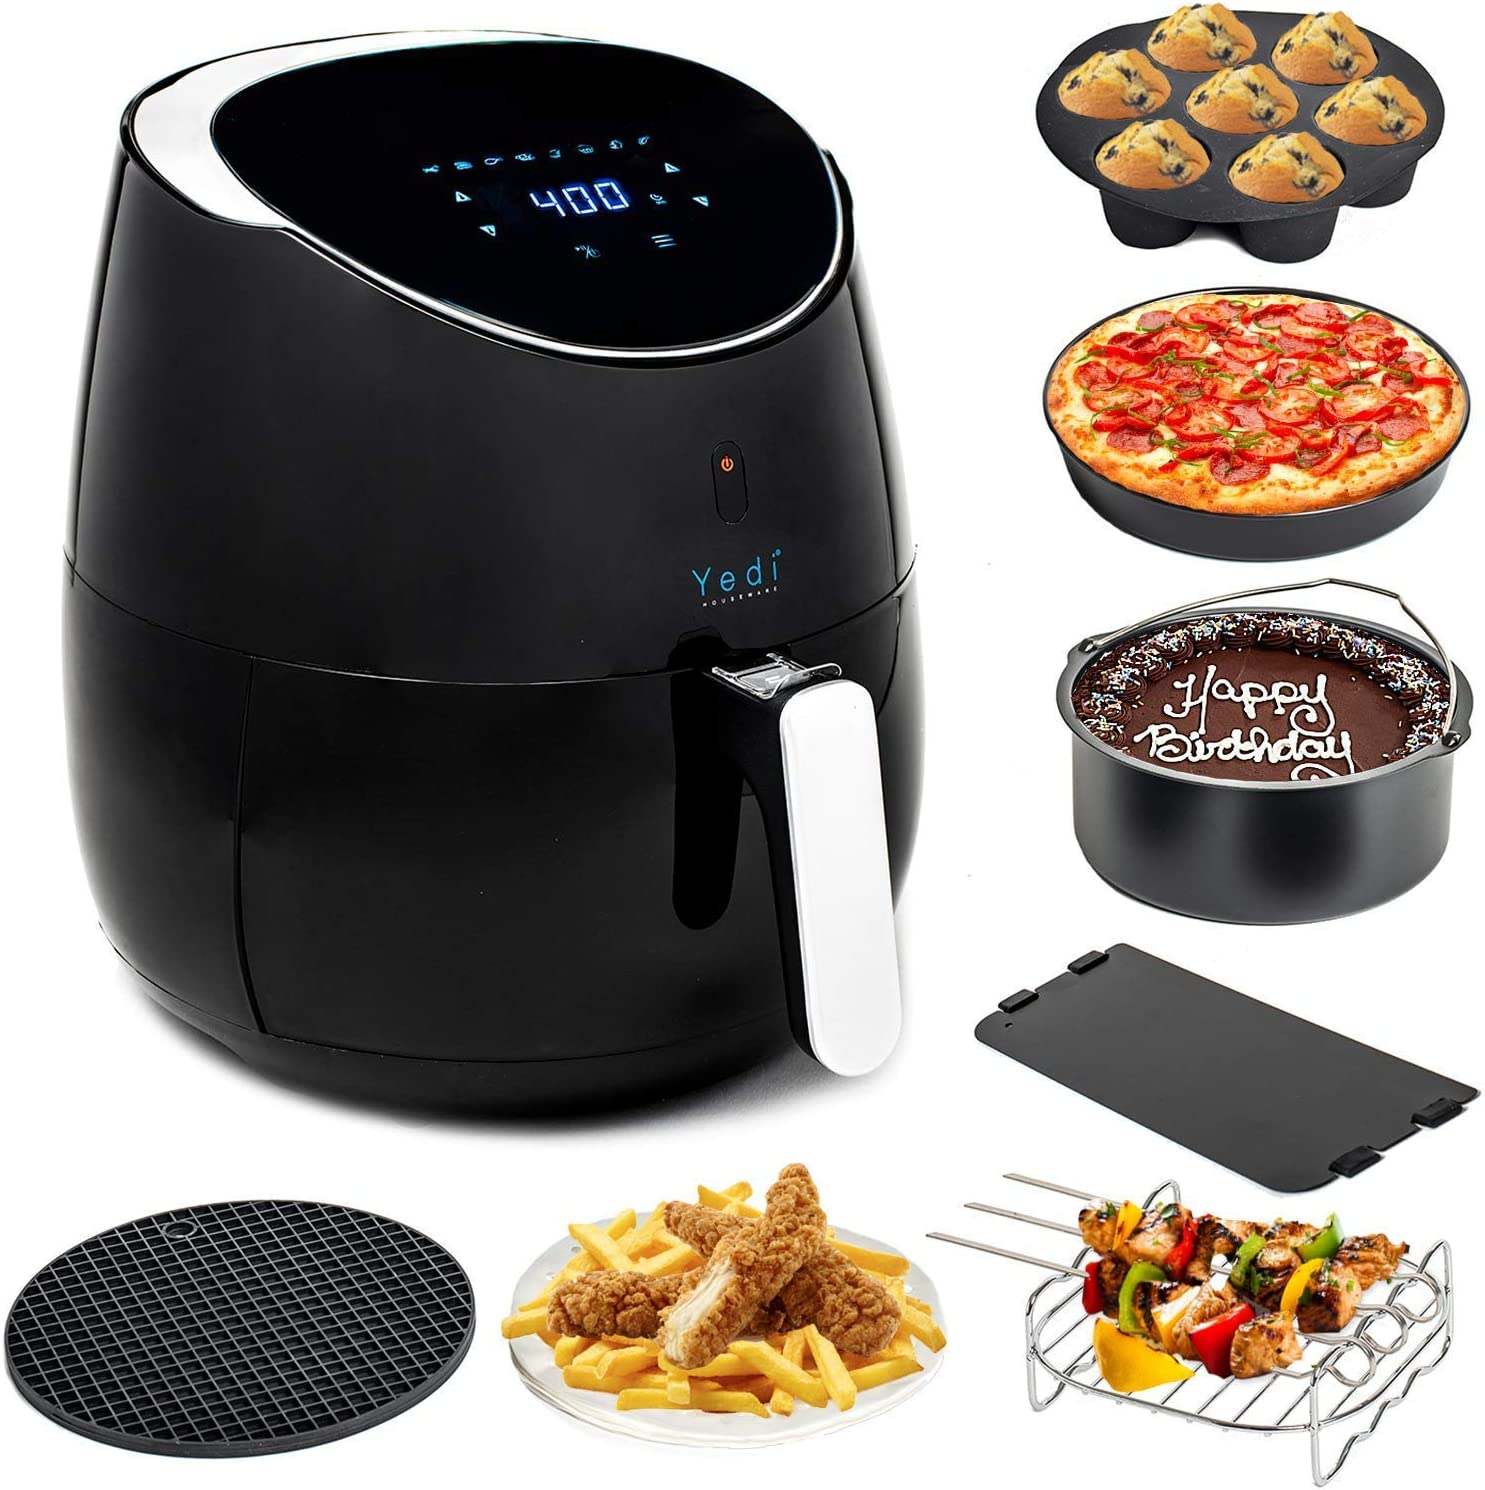 Yedi Houseware 5.8 Quart Air Fryer Review